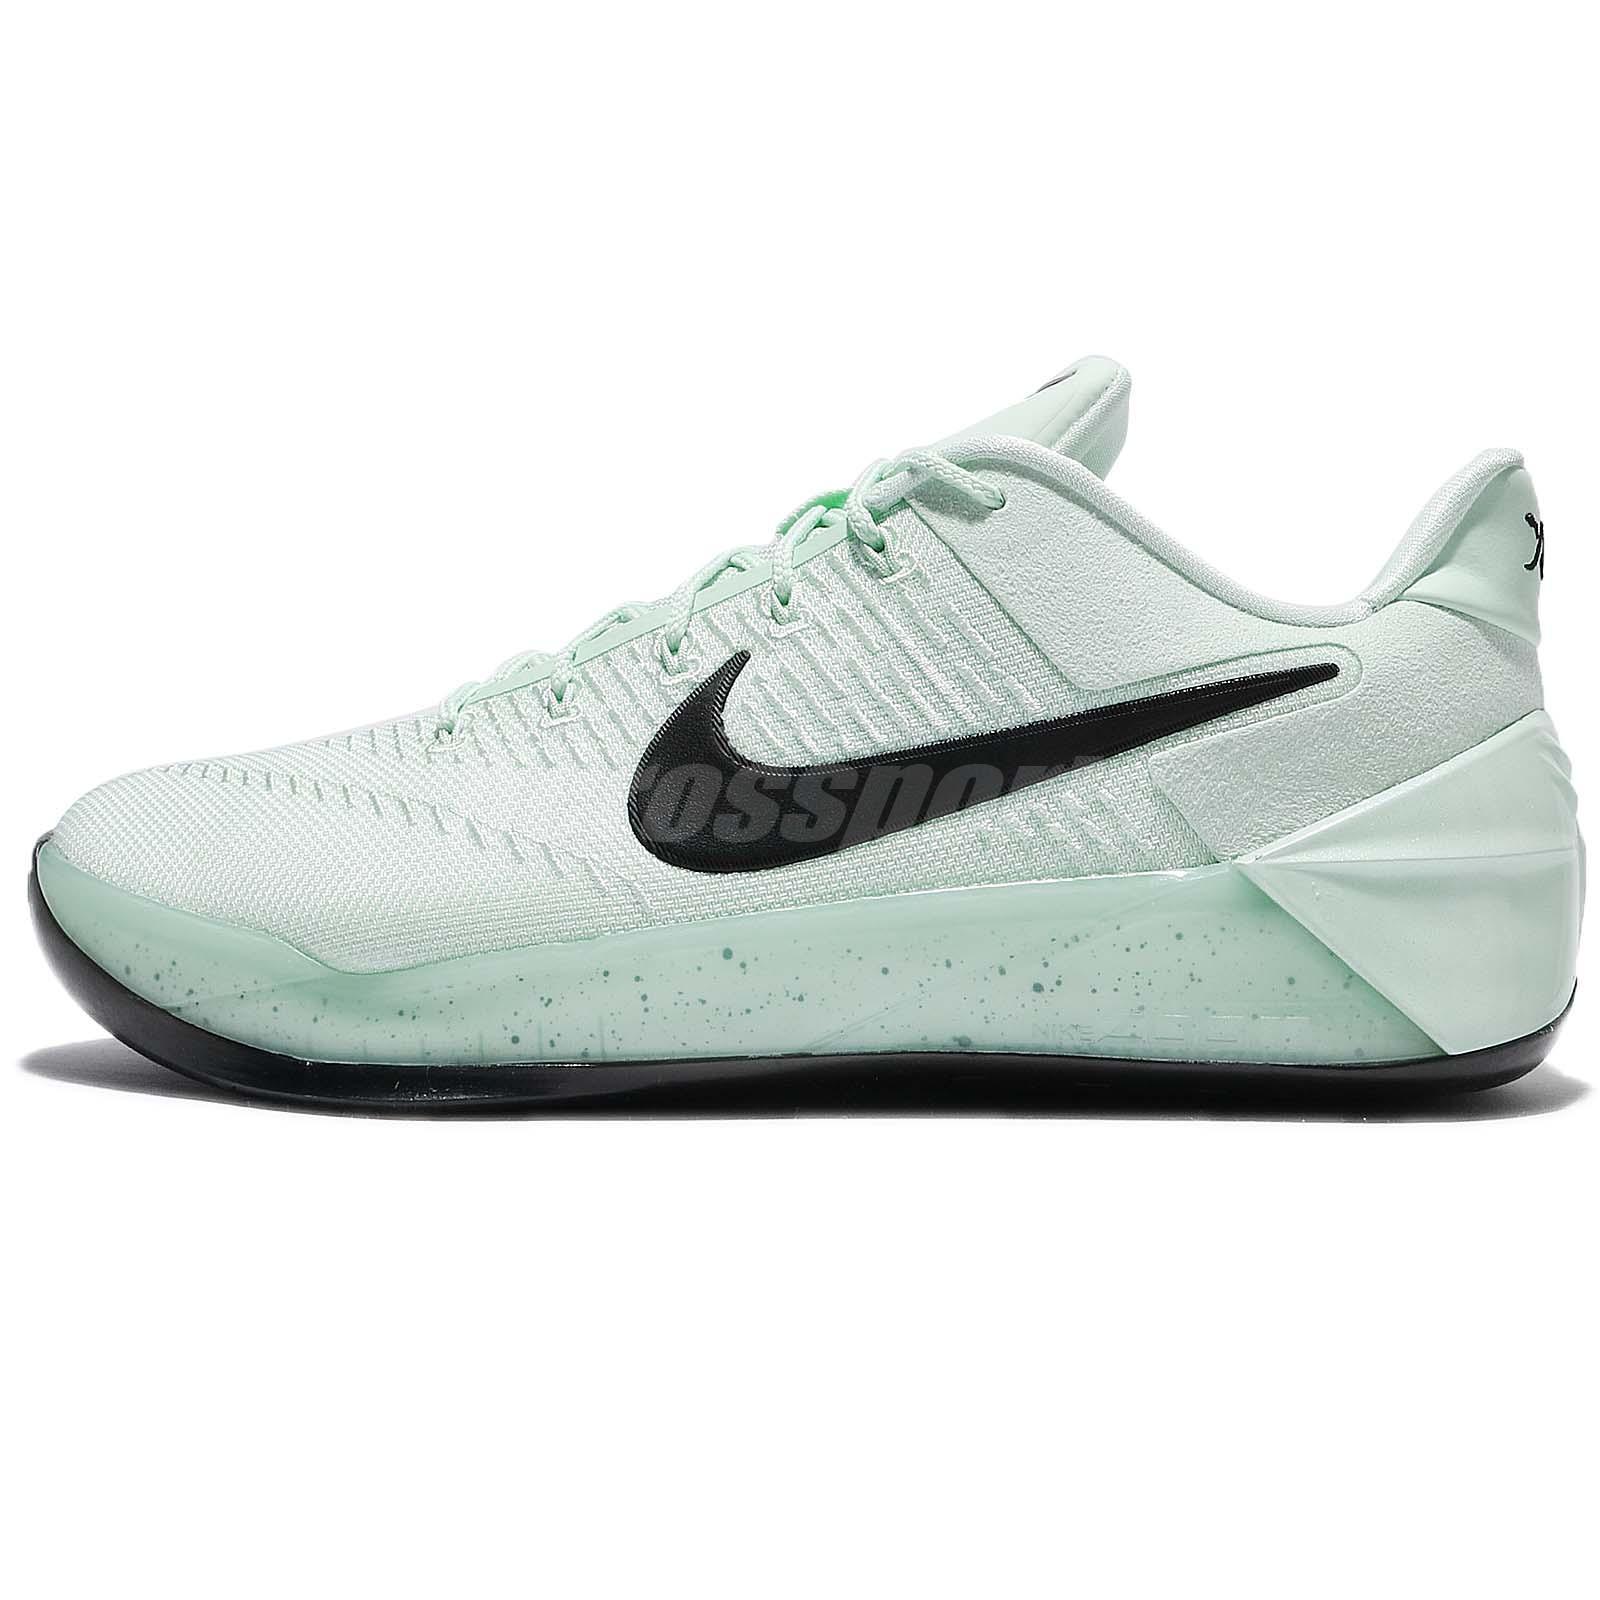 huge selection of 5e8f9 44bf1 Nike Kobe A.D. EP 12 Bryant Igloo Black Men Basketball Shoes Sneakers  852427300 - tualu.org